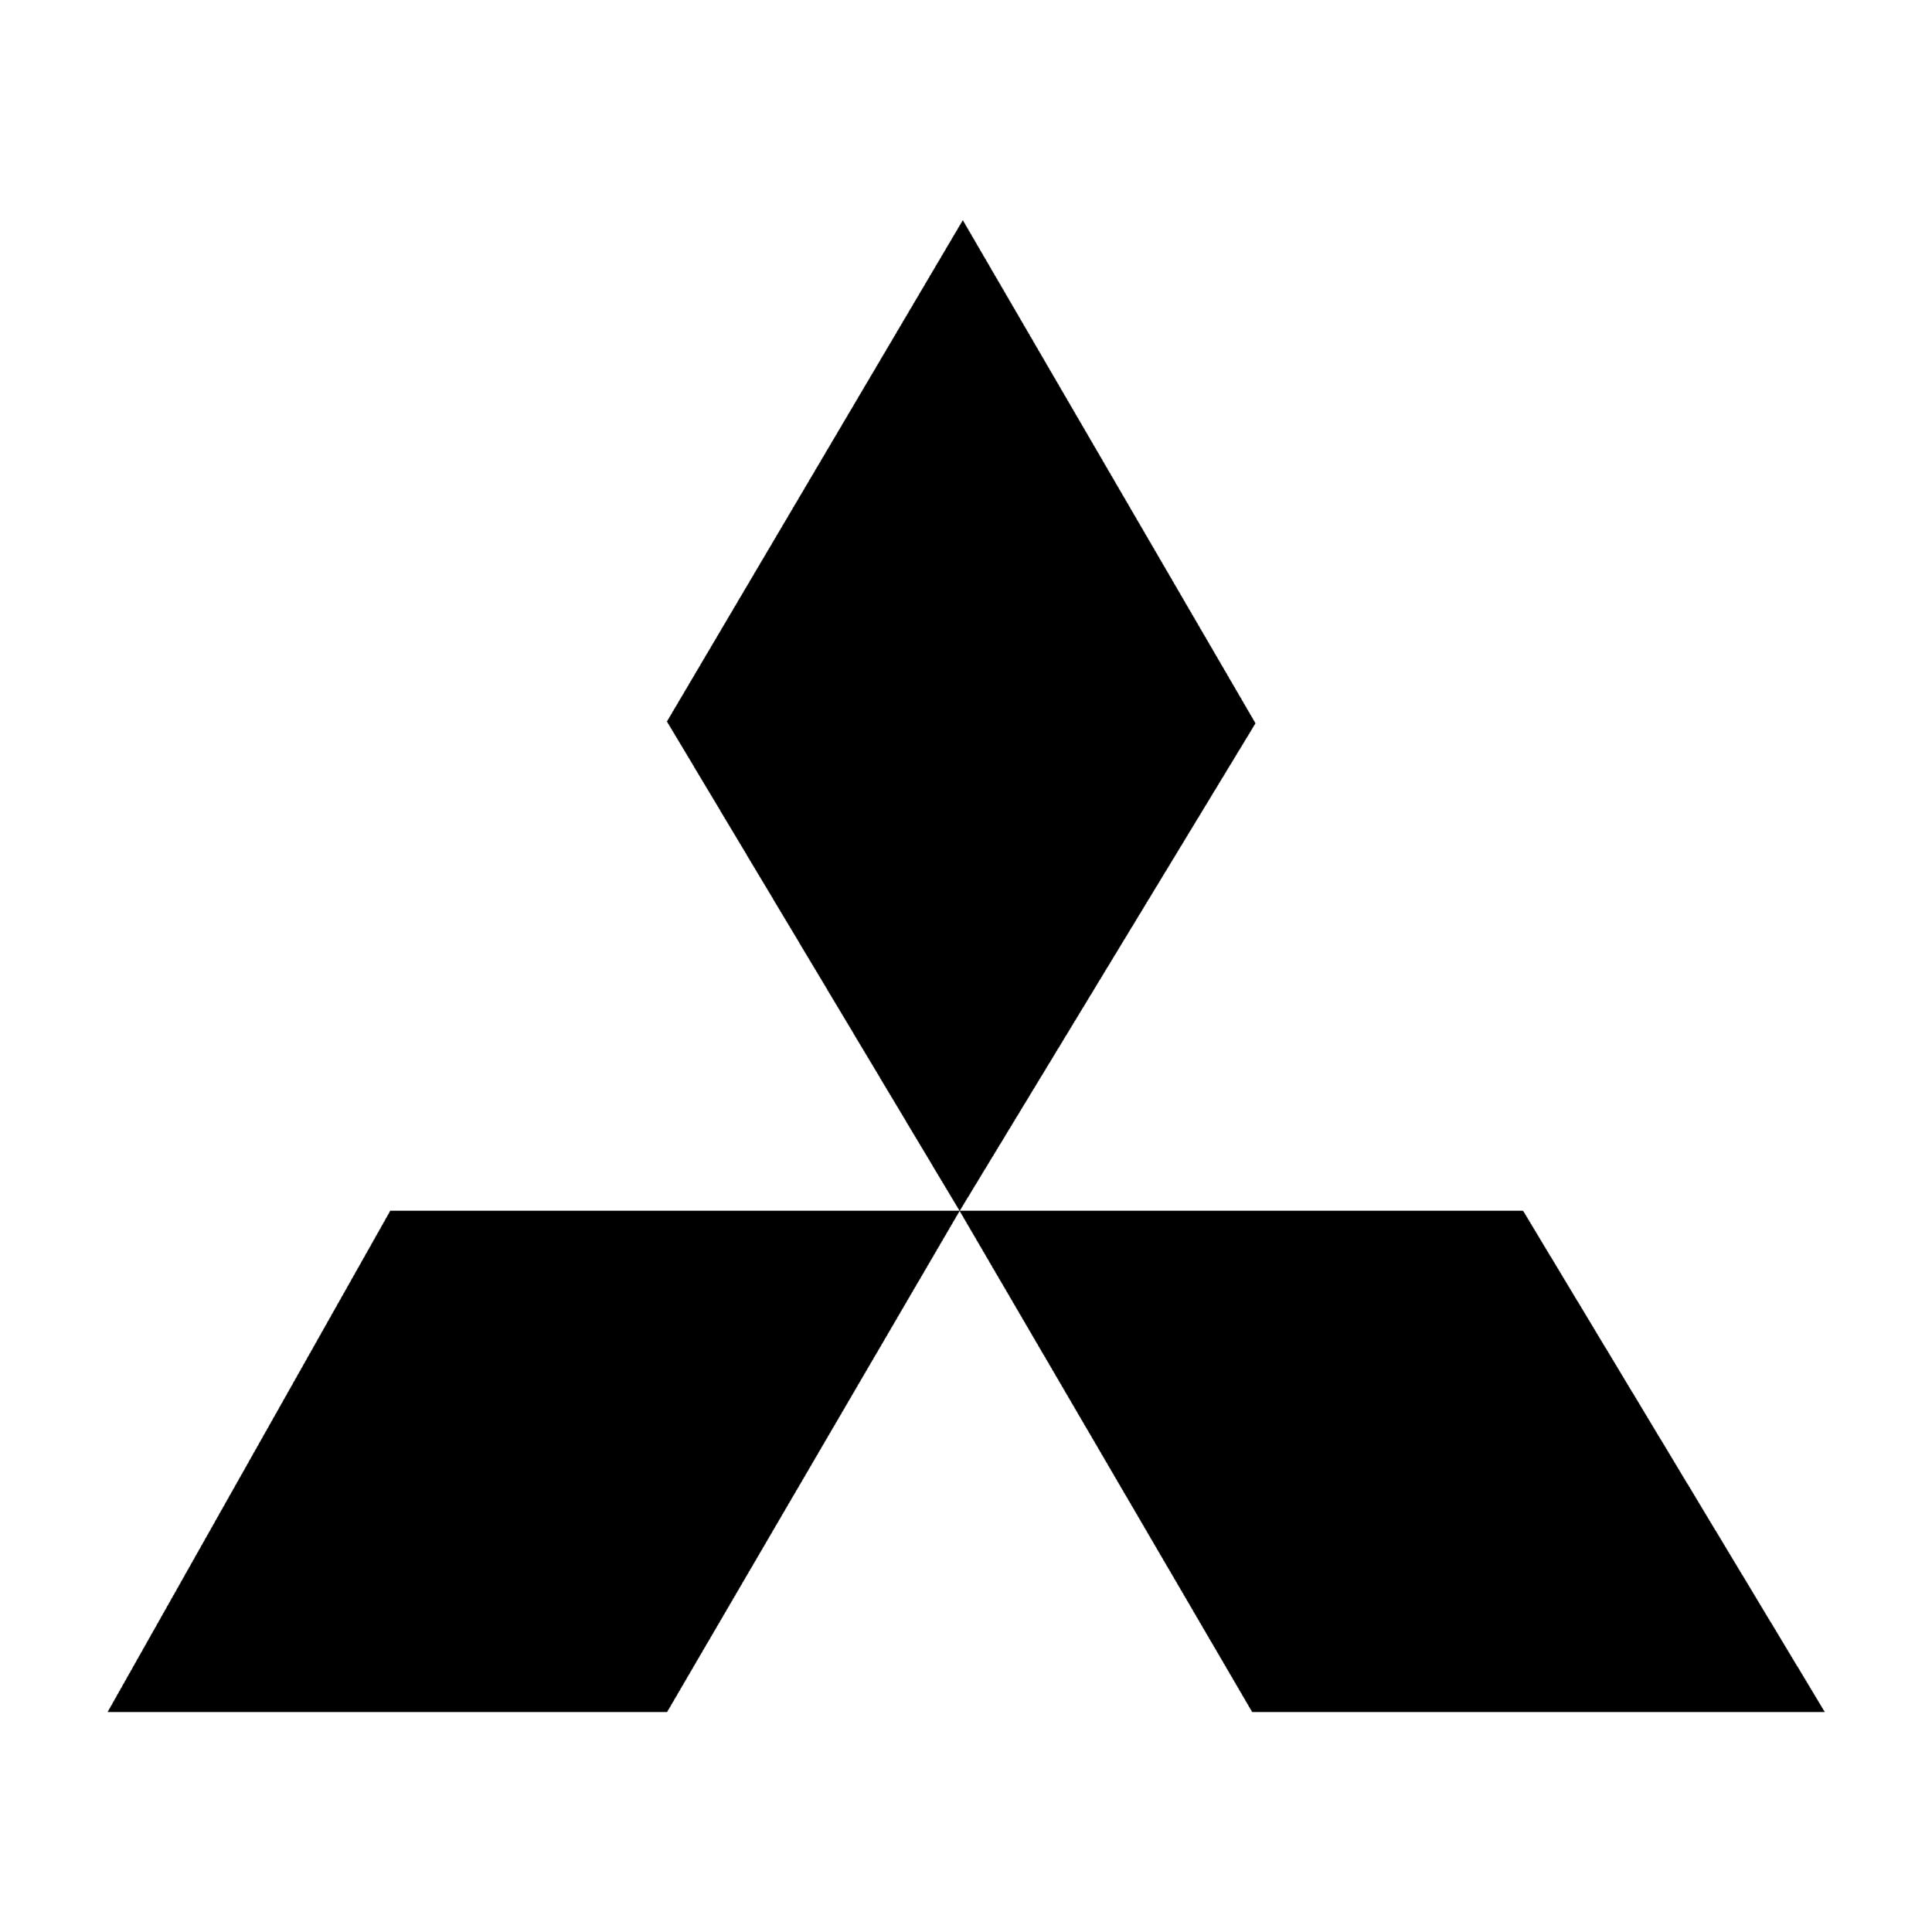 sticker-mitsubishi-ref-9-logo-l200-pajero-sport-4x4-land-tout-terrain-competition-rallye-autocollant-stickers-min